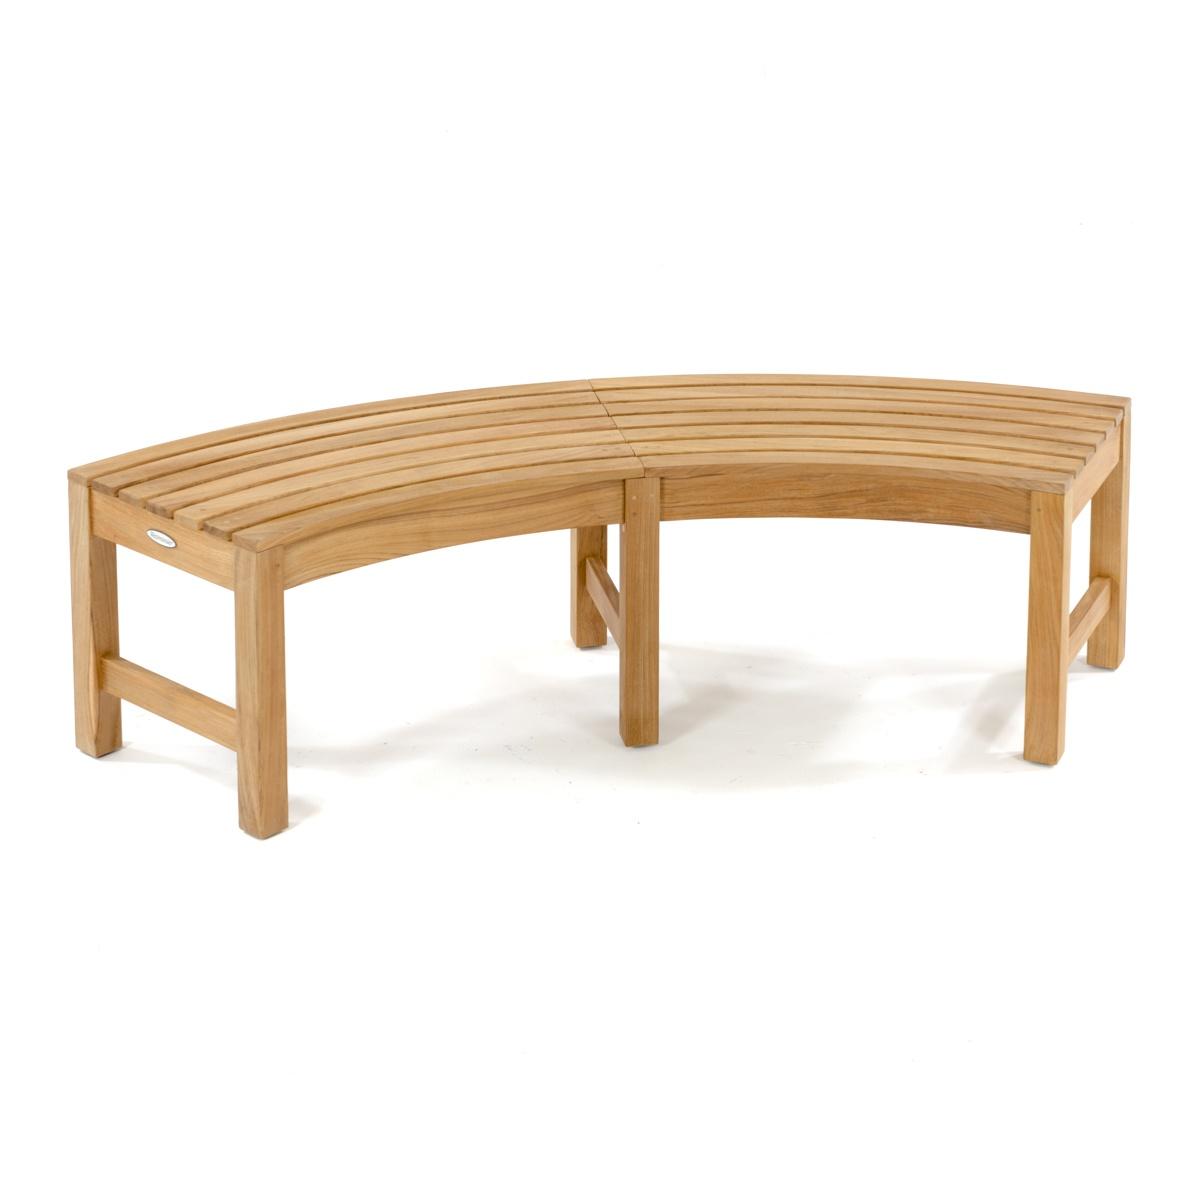 Buckingham Teak Backless Curved Round Bench Westminster Teak Outdoor Furniture